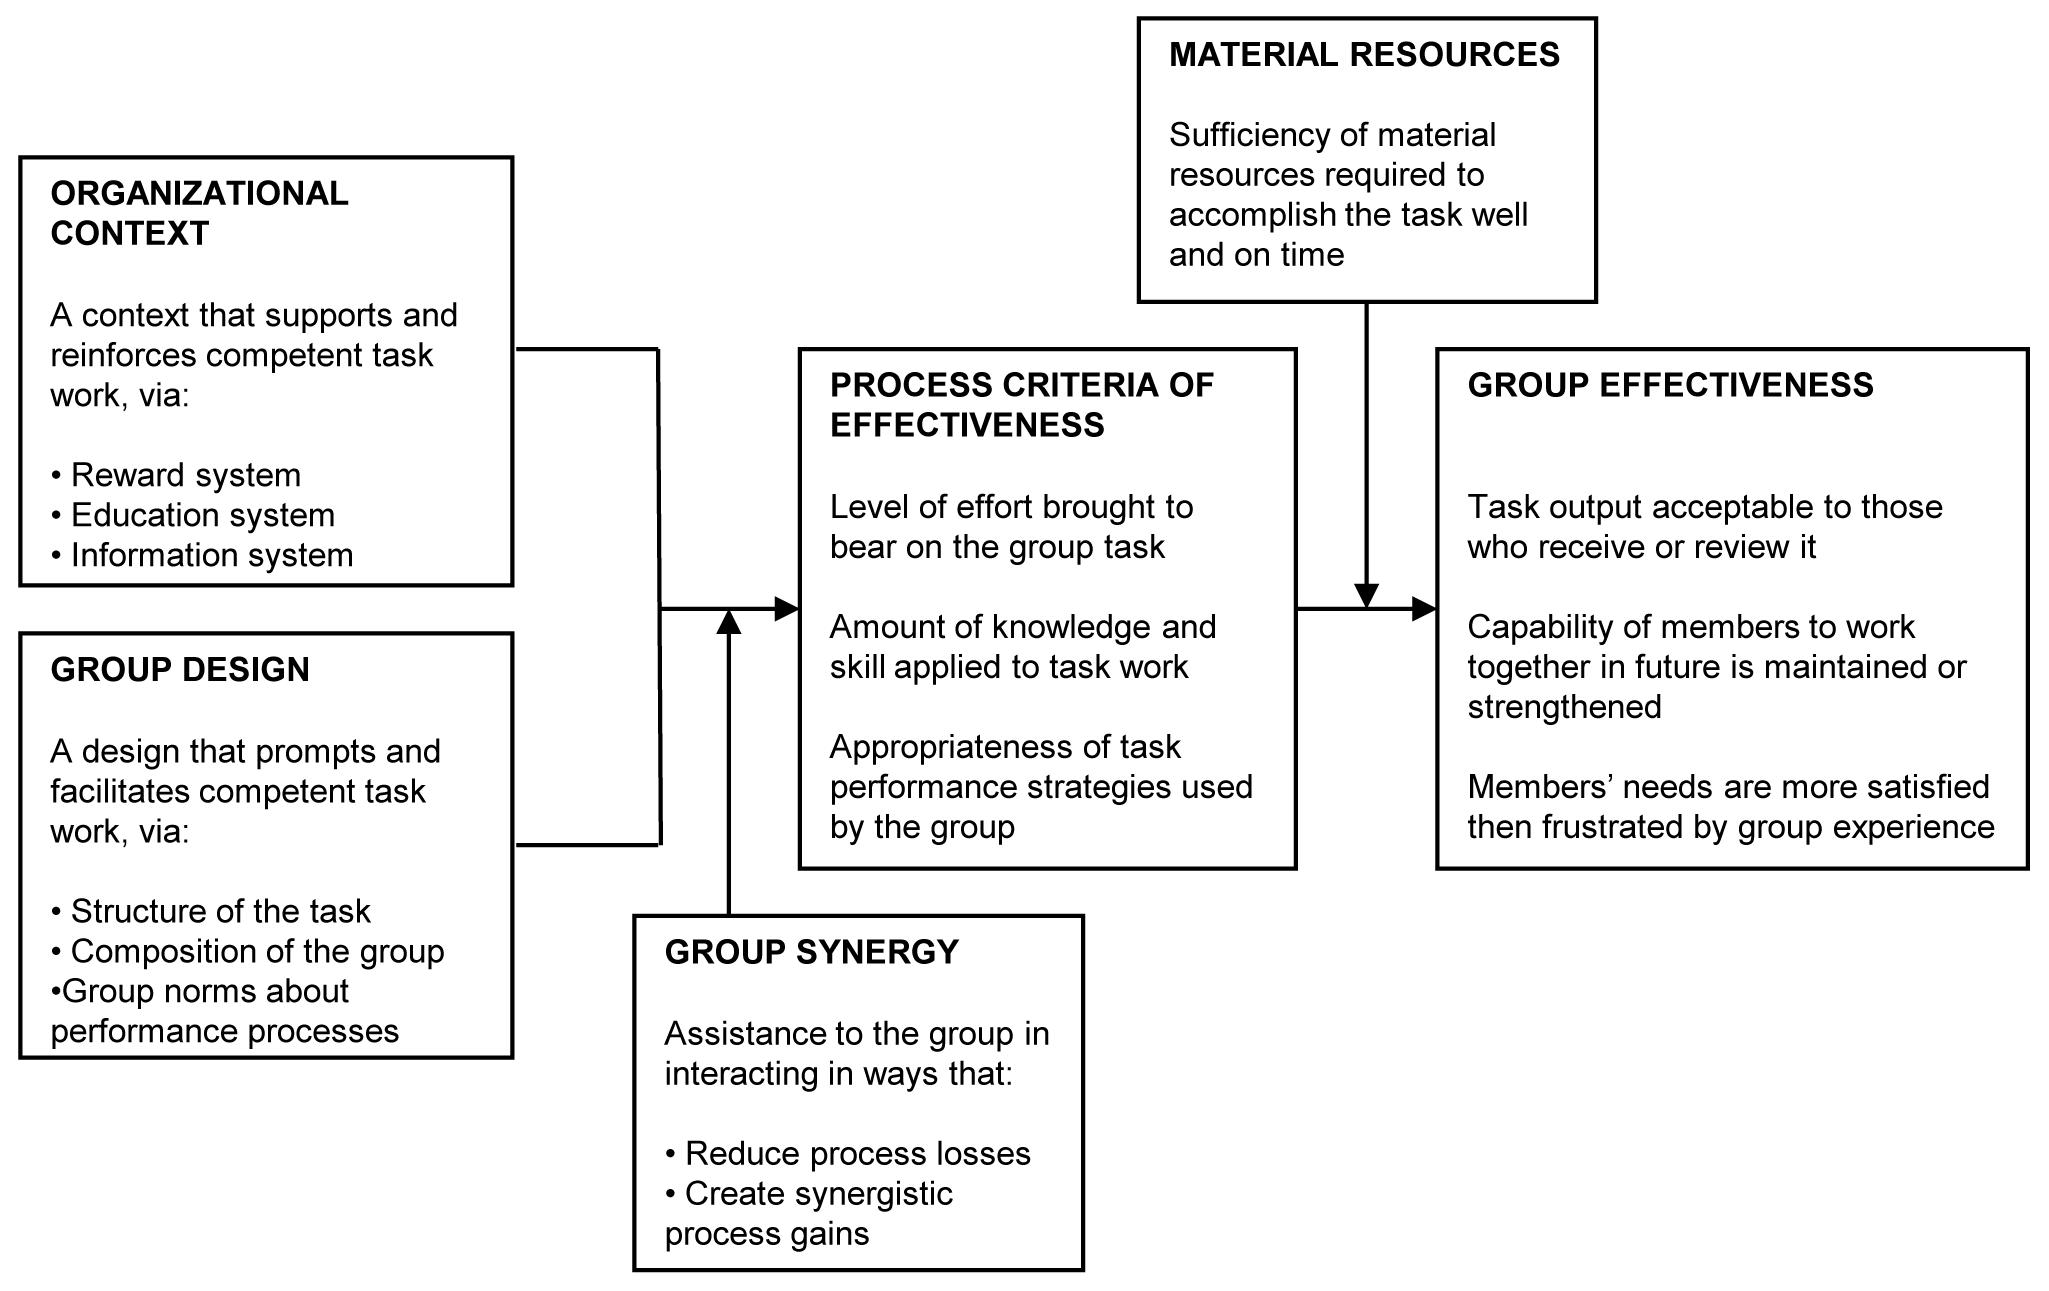 Hackman's normative model of group effectiveness.